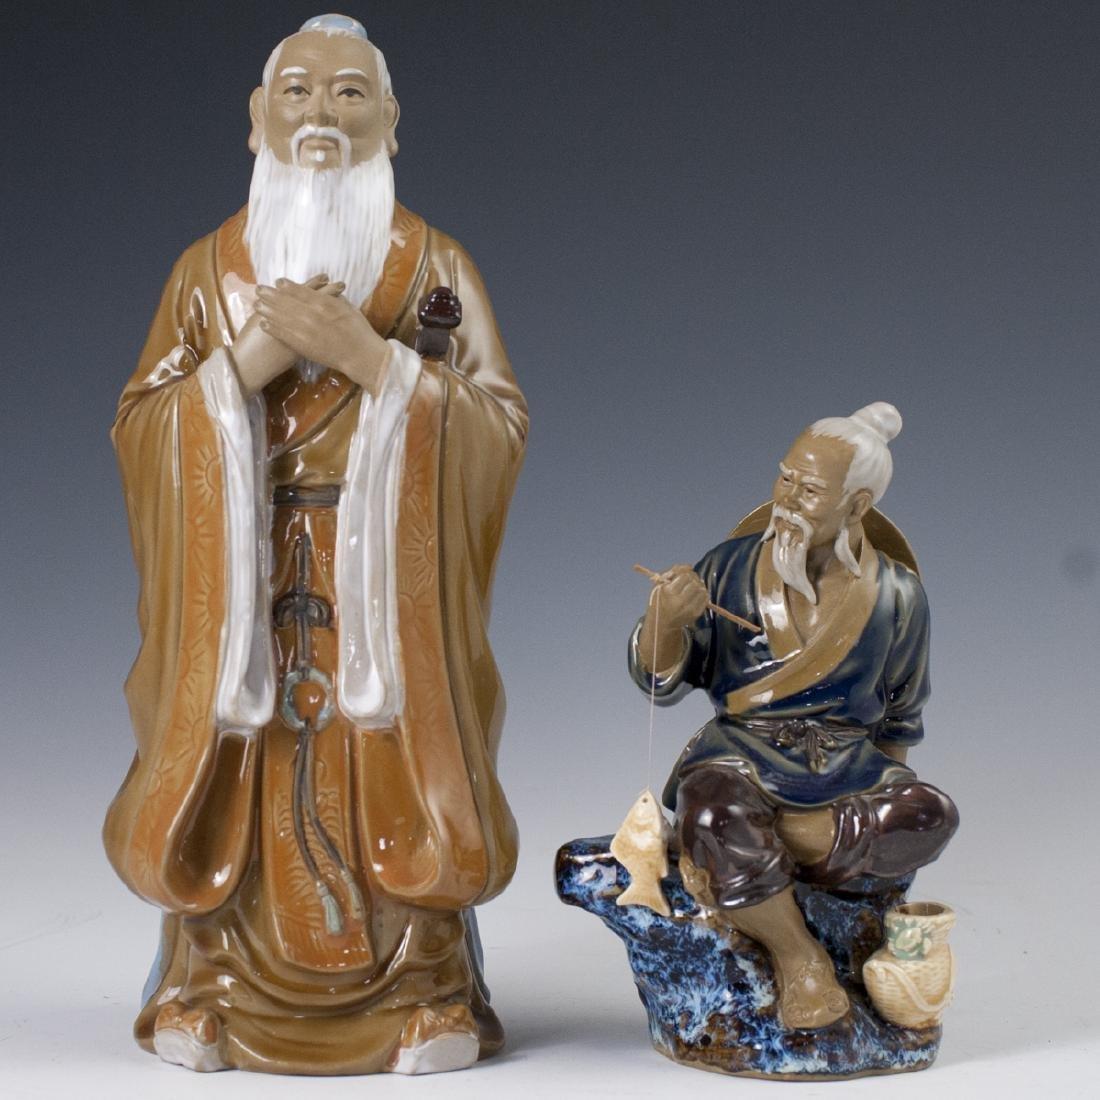 Chinese Glazed Ceramic Mudmen Figurines